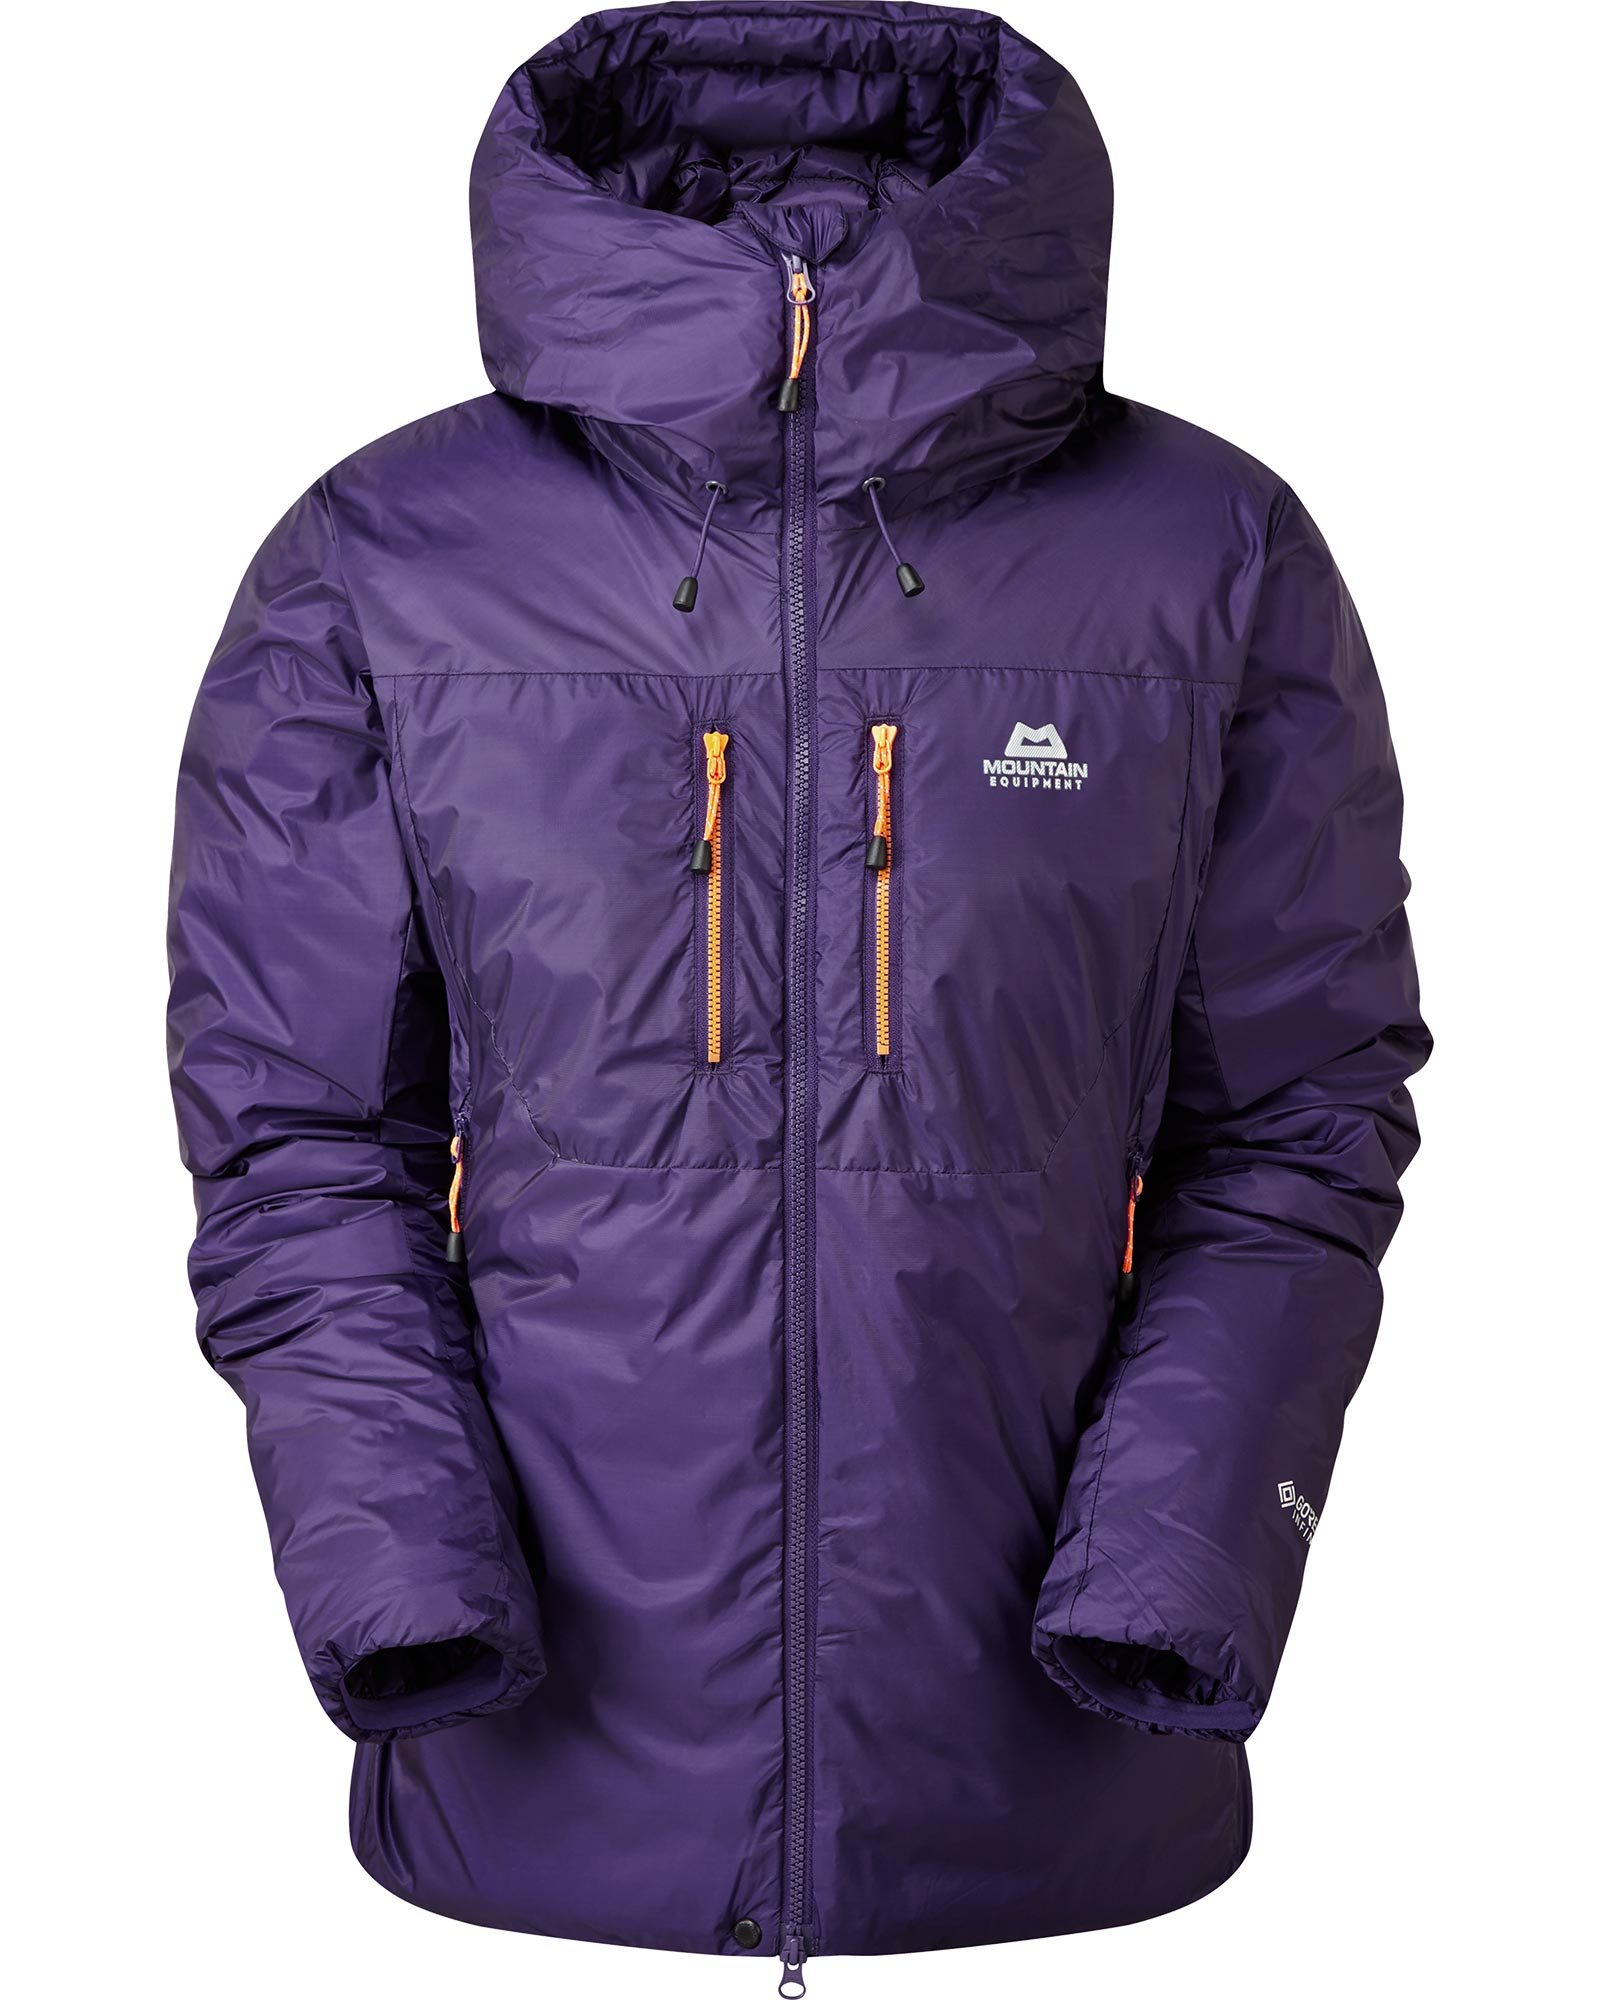 Mountain Equipment Women's Kryos Down Jacket 0